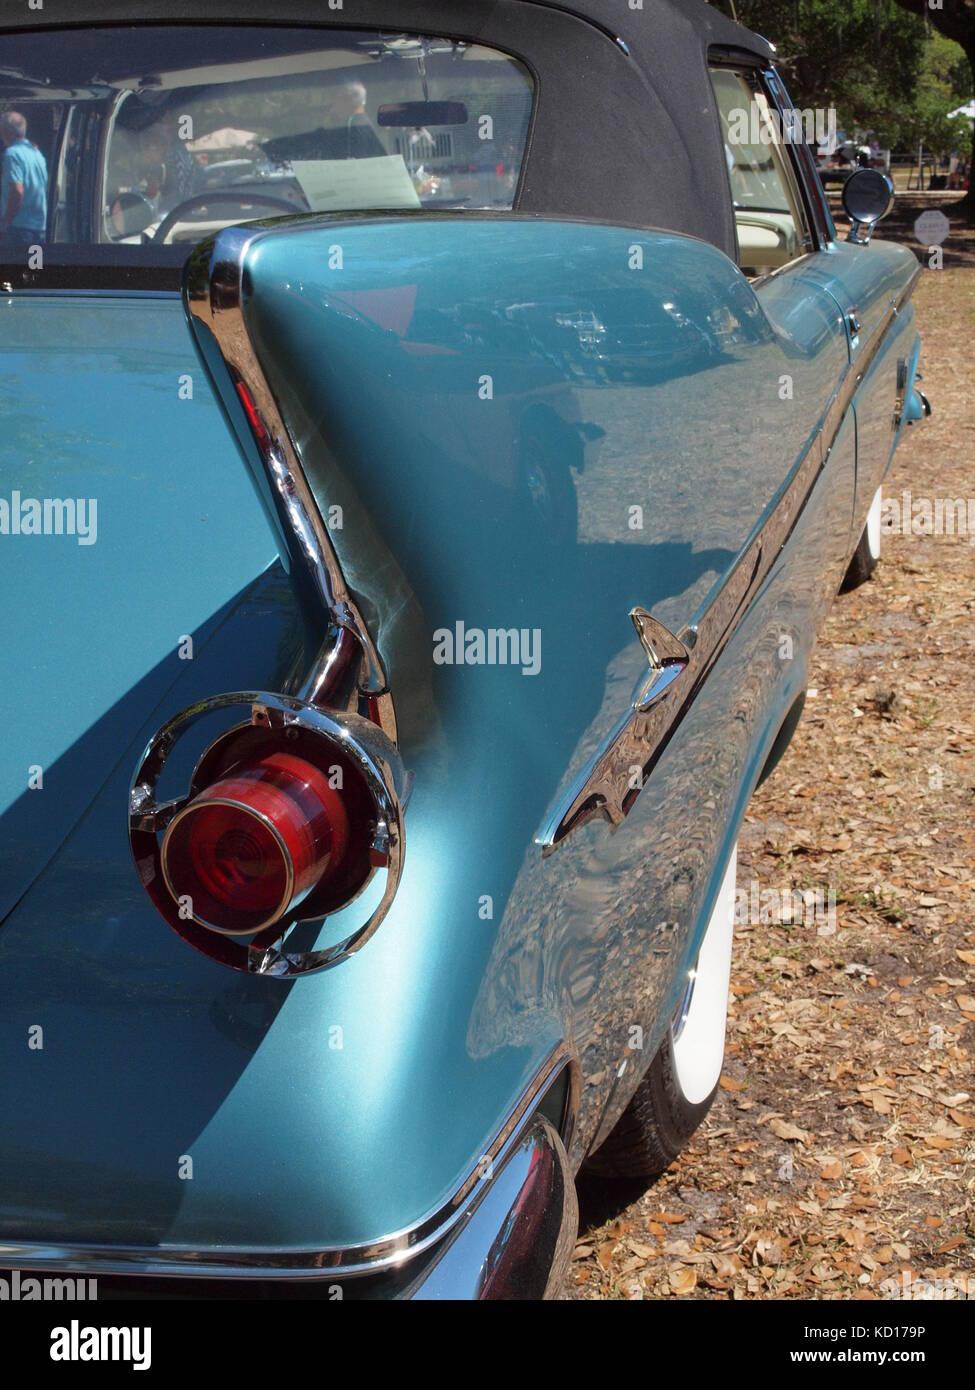 Giant fifties era fins on Chrysler convertible in Vero Beach, Florida Stock Photo